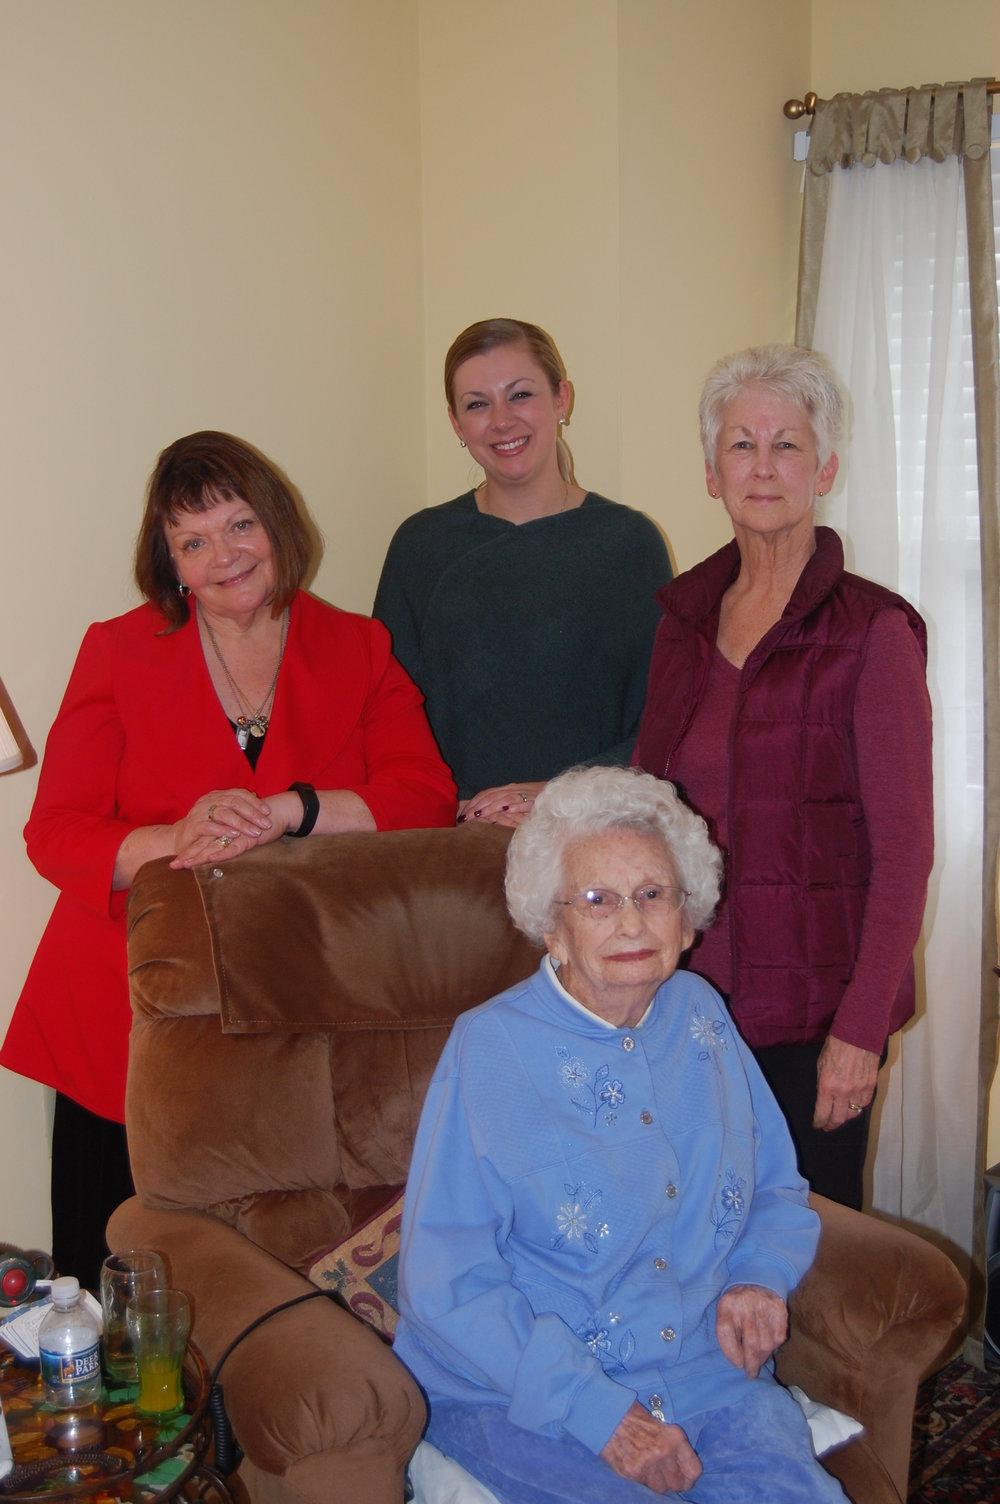 During the Christmas holidays, Elms President  Deborah Farquhar Jones  and  Sarah Hutzler-Psihountakis '07  visited alumna  Jane Botzum Ahern  and her daughter  Maureen Winkelmann .